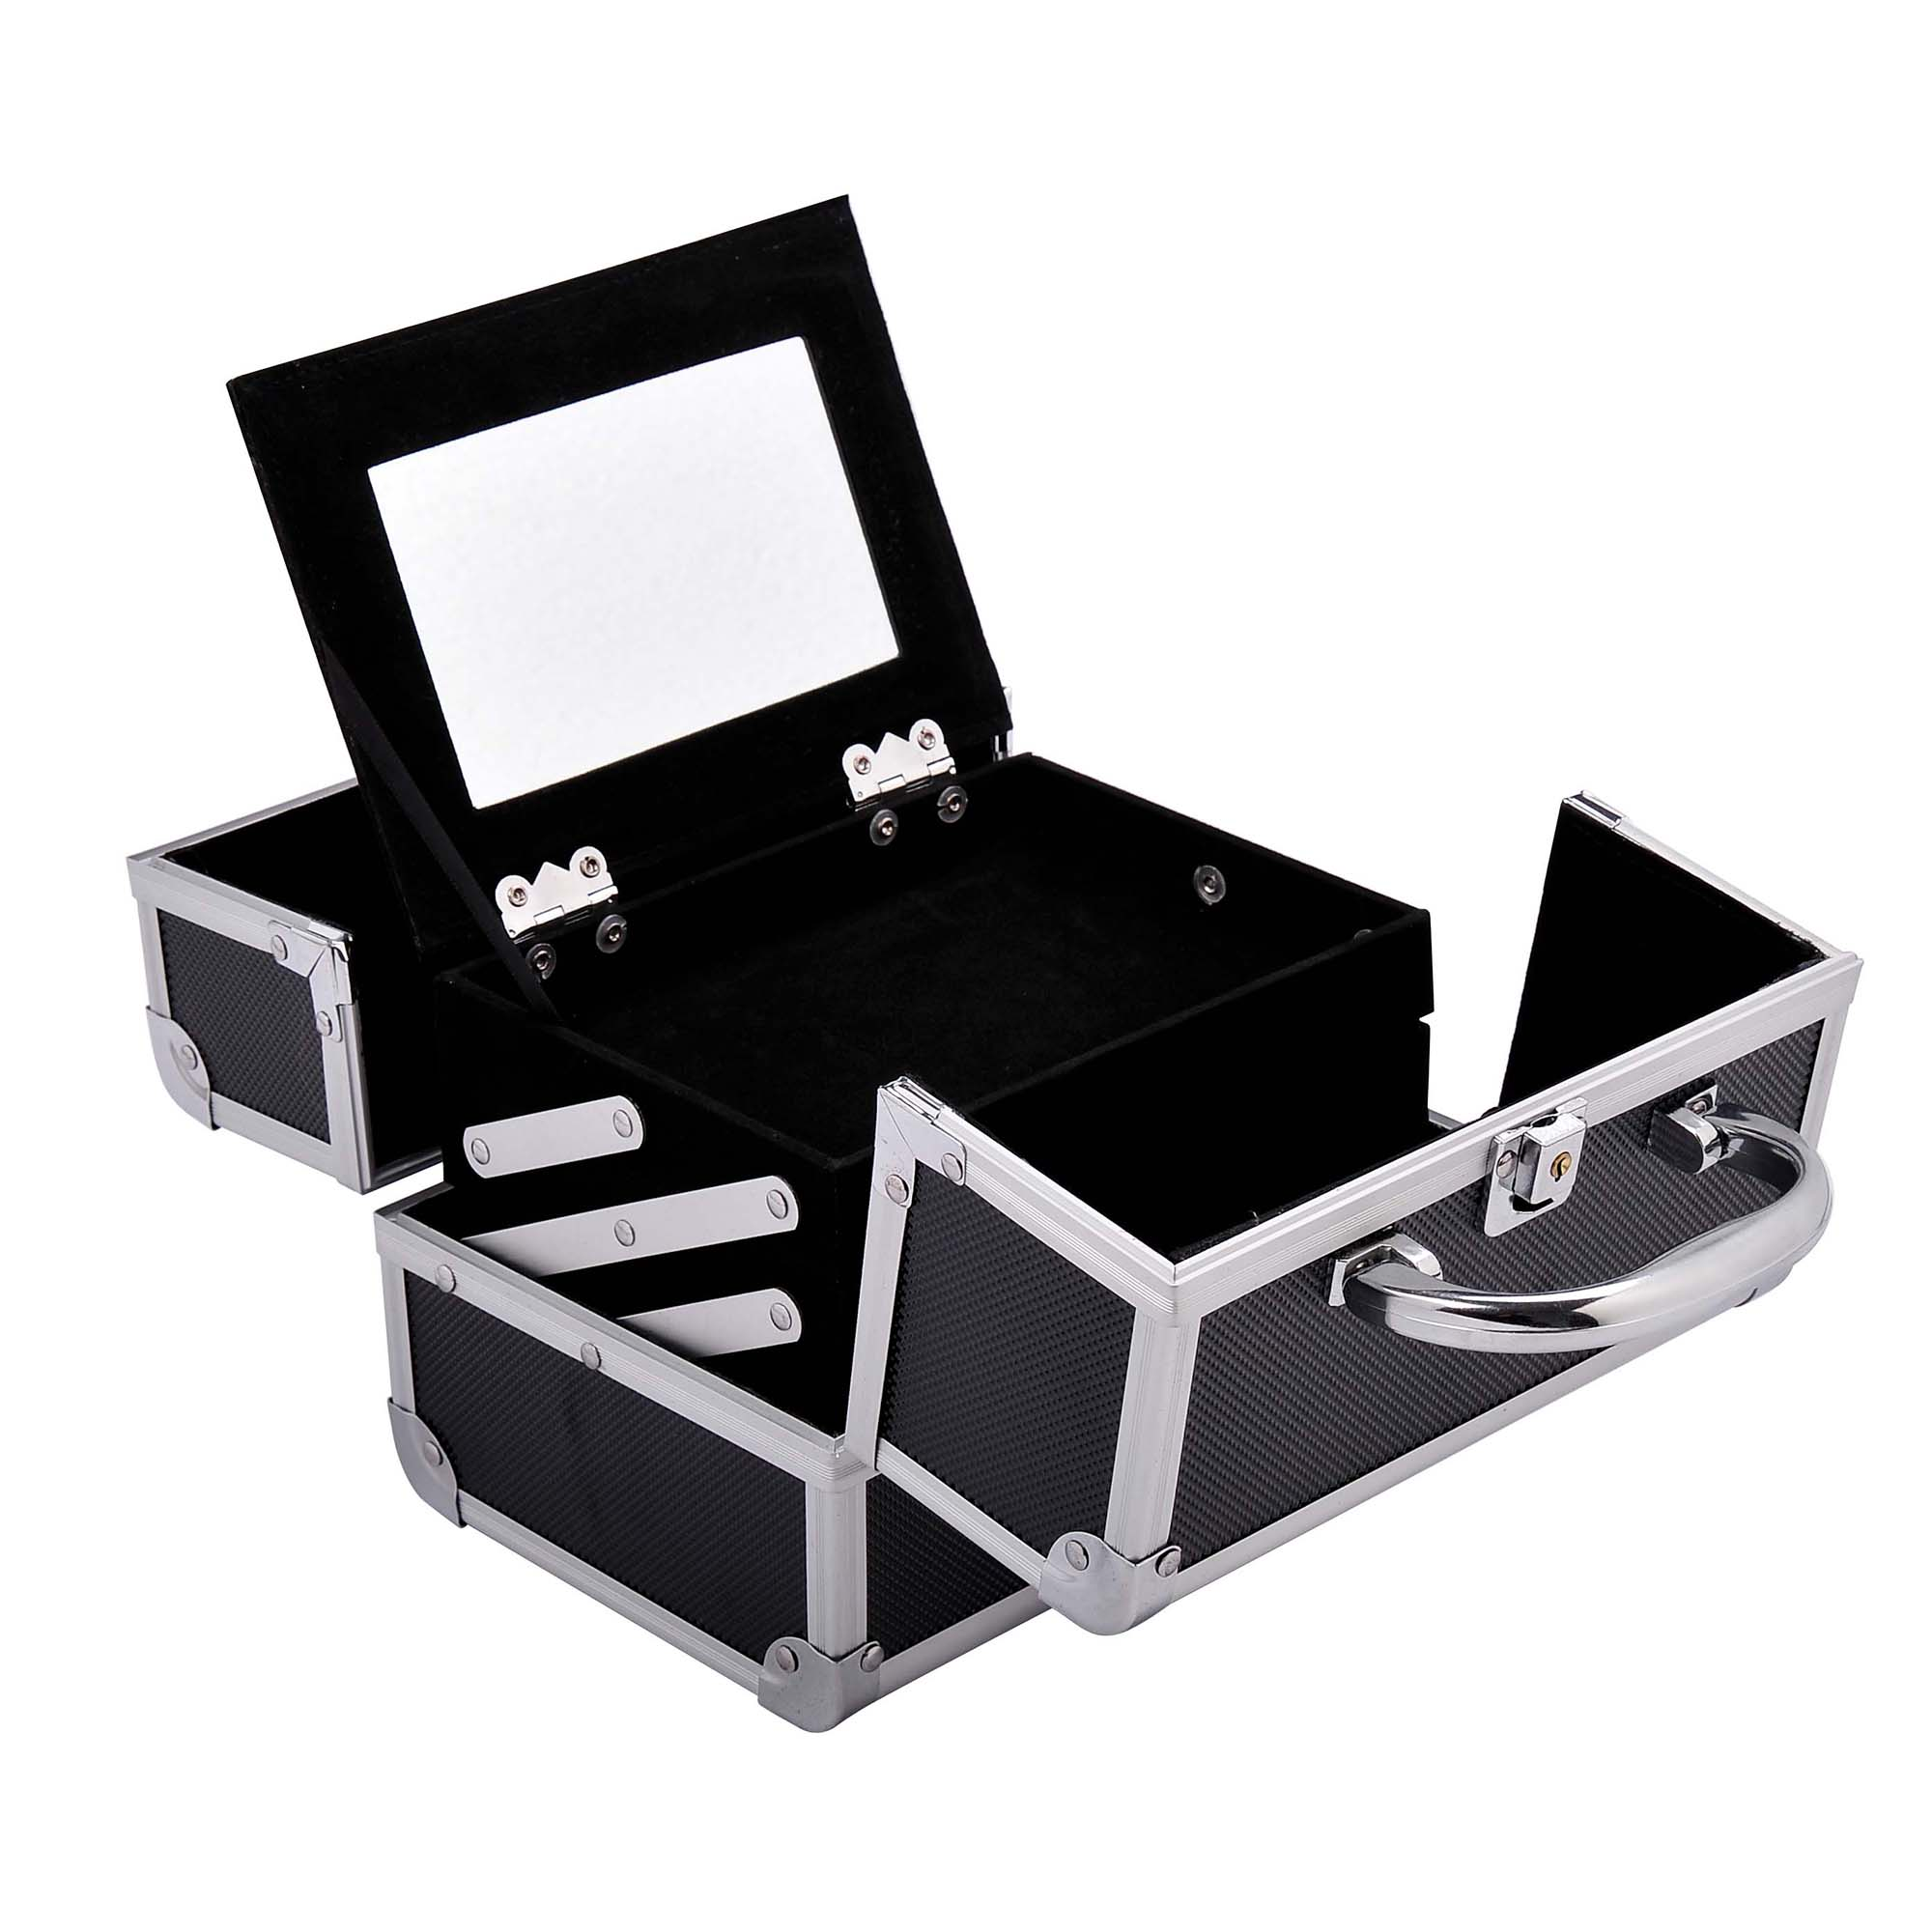 Aluminum-Rolling-Makeup-Train-Case-Trolley-Organizer-Storage-Box-Lockable thumbnail 25